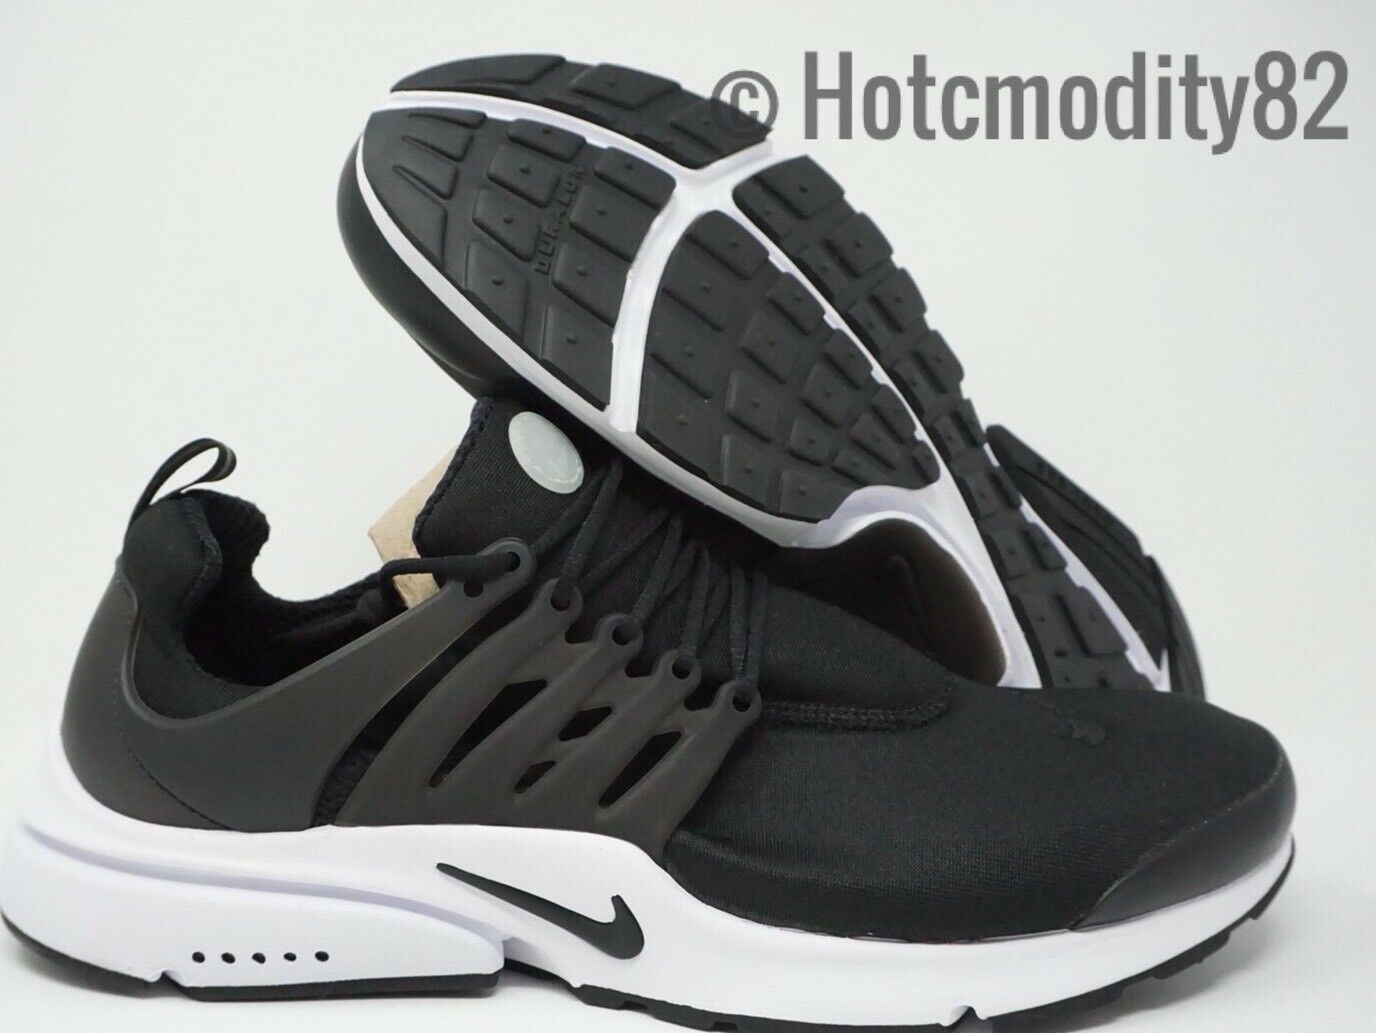 Nike Air Presto Essential Mens Sneaker Black White 848187-009 Size Size 848187-009 14 890218